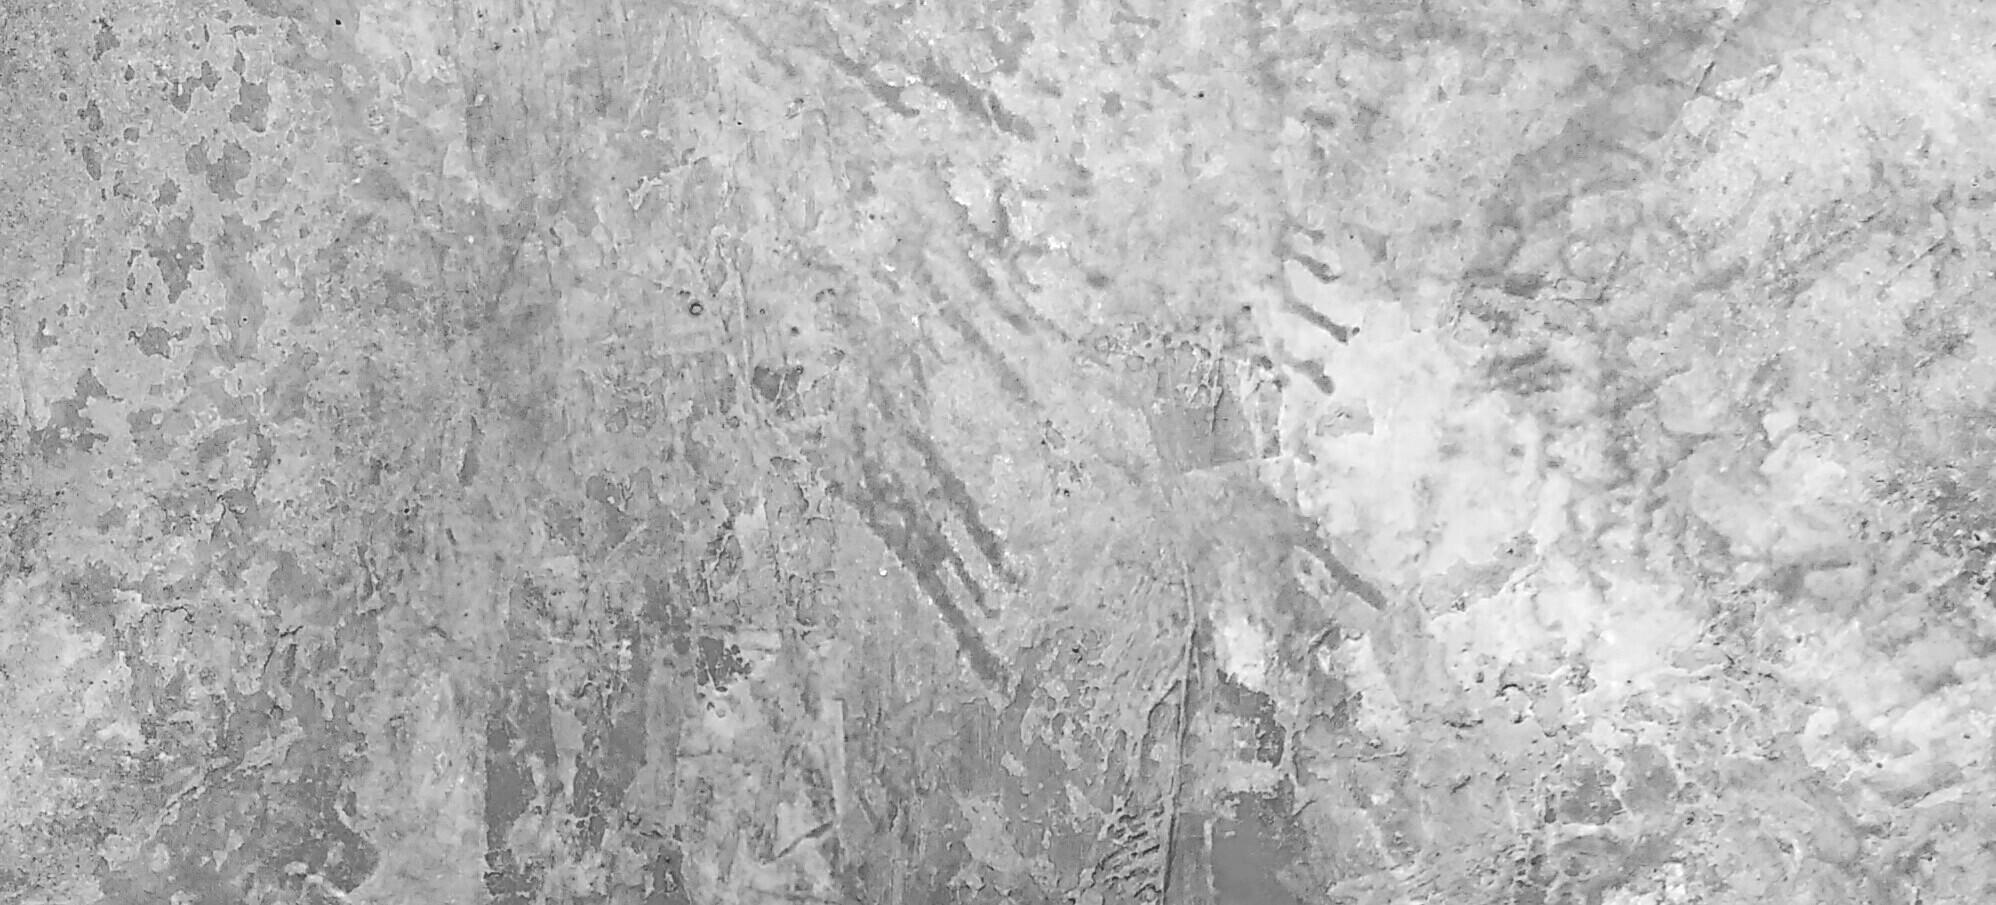 Untitled Microprint (2)